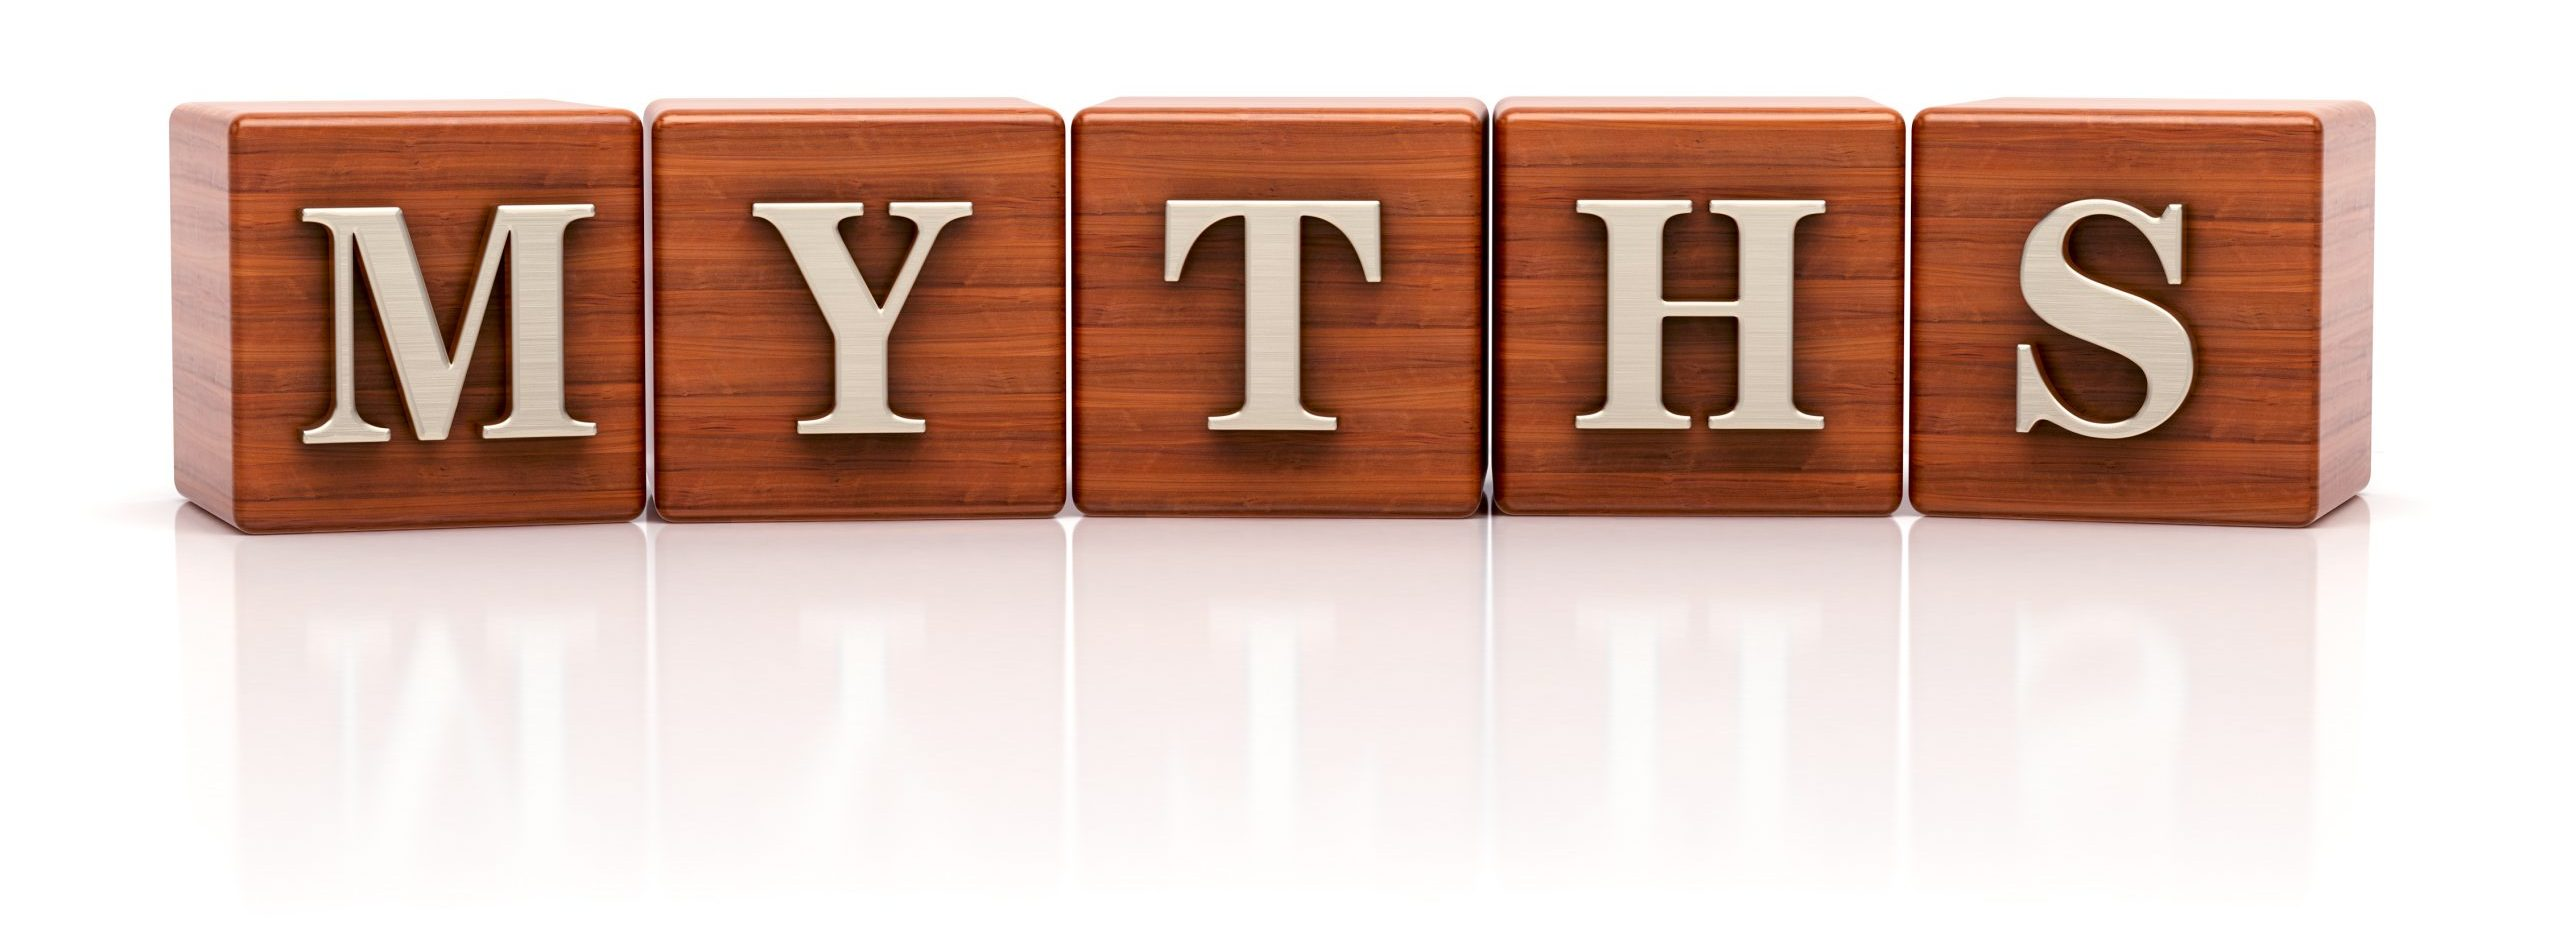 Myths written on wooden cubes